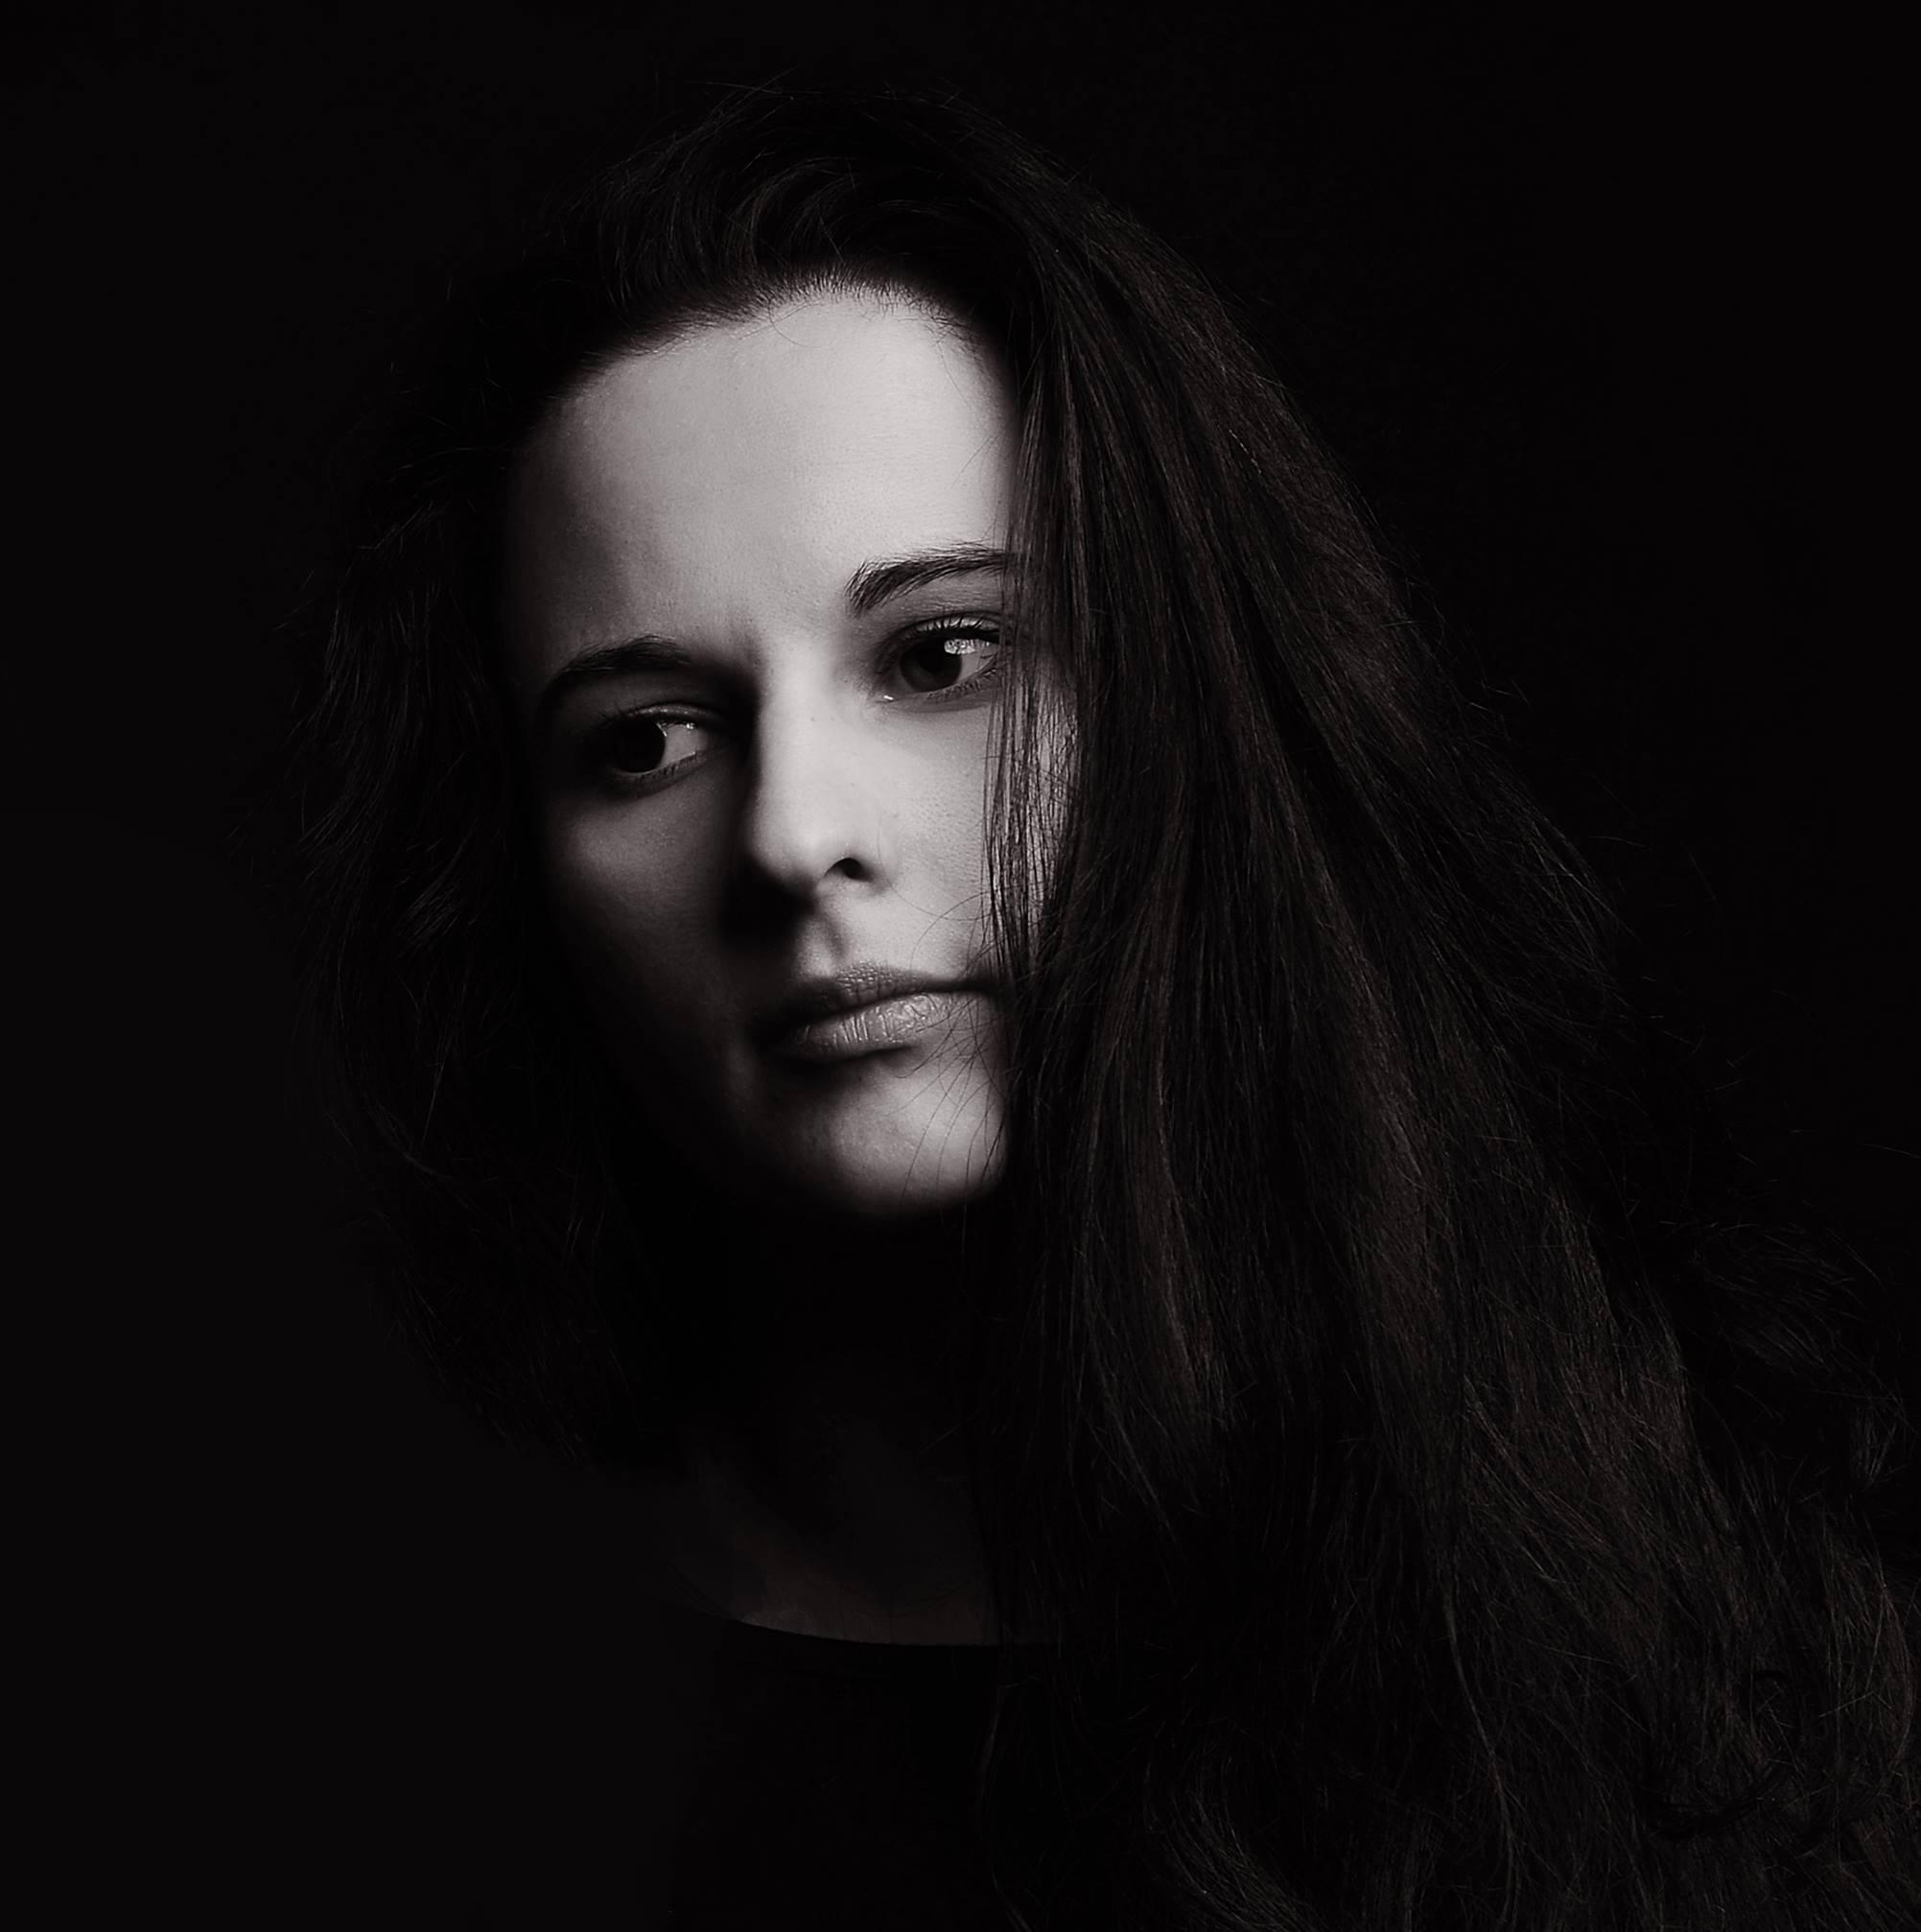 Photo: Alisa Kuznetsova